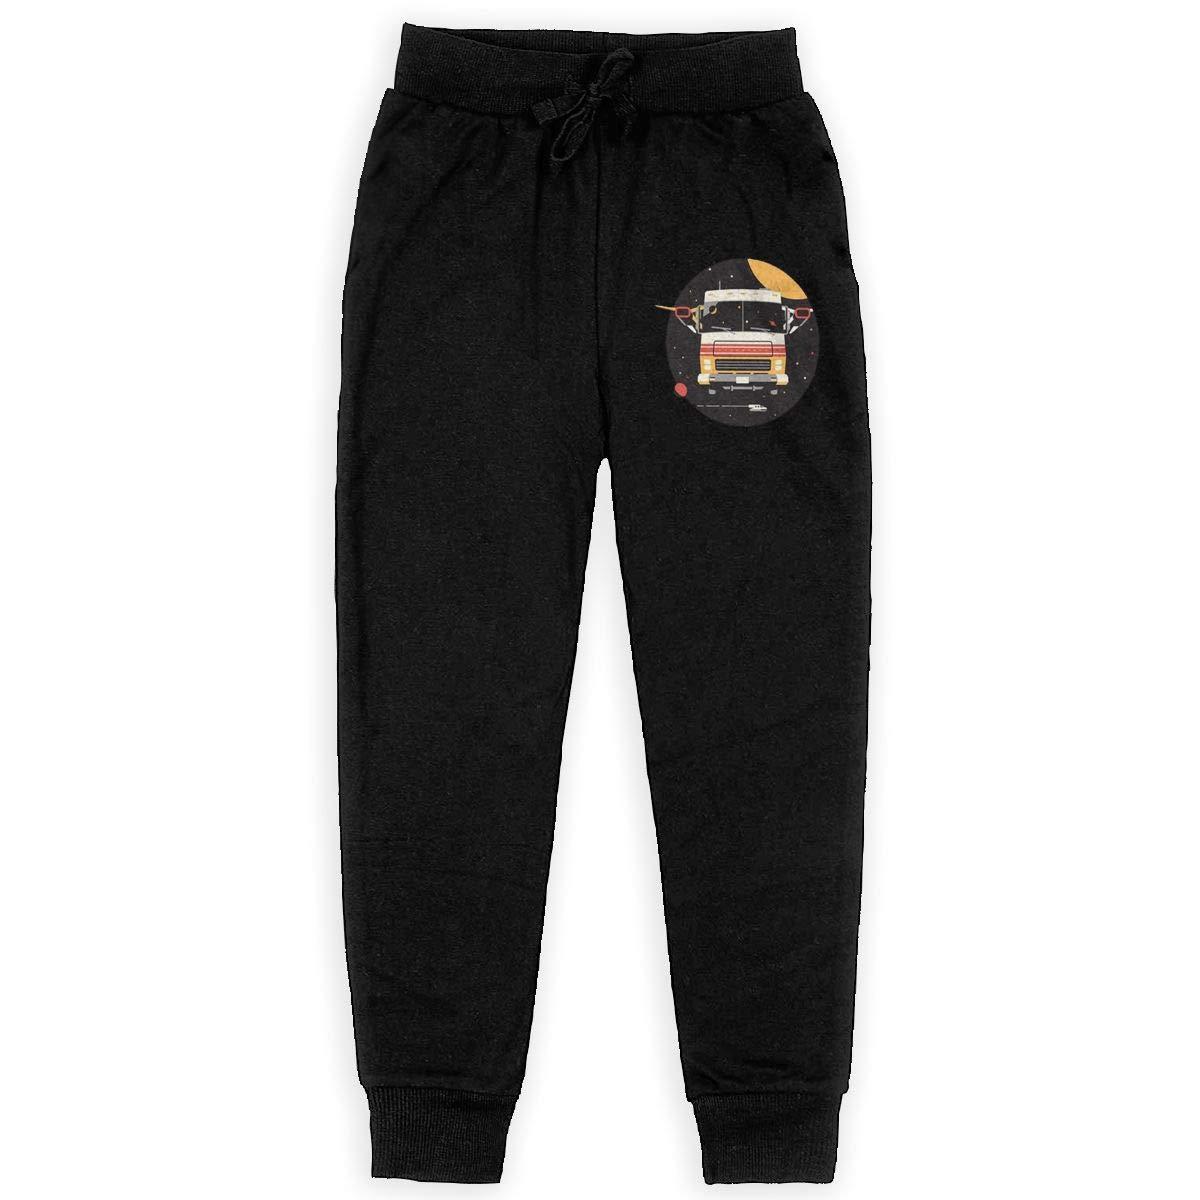 Kim Mittelstaedt Spaceballs Space Craft Spaceship Boys Big Active Basic Casual Pants Sweatpants for Boys Black